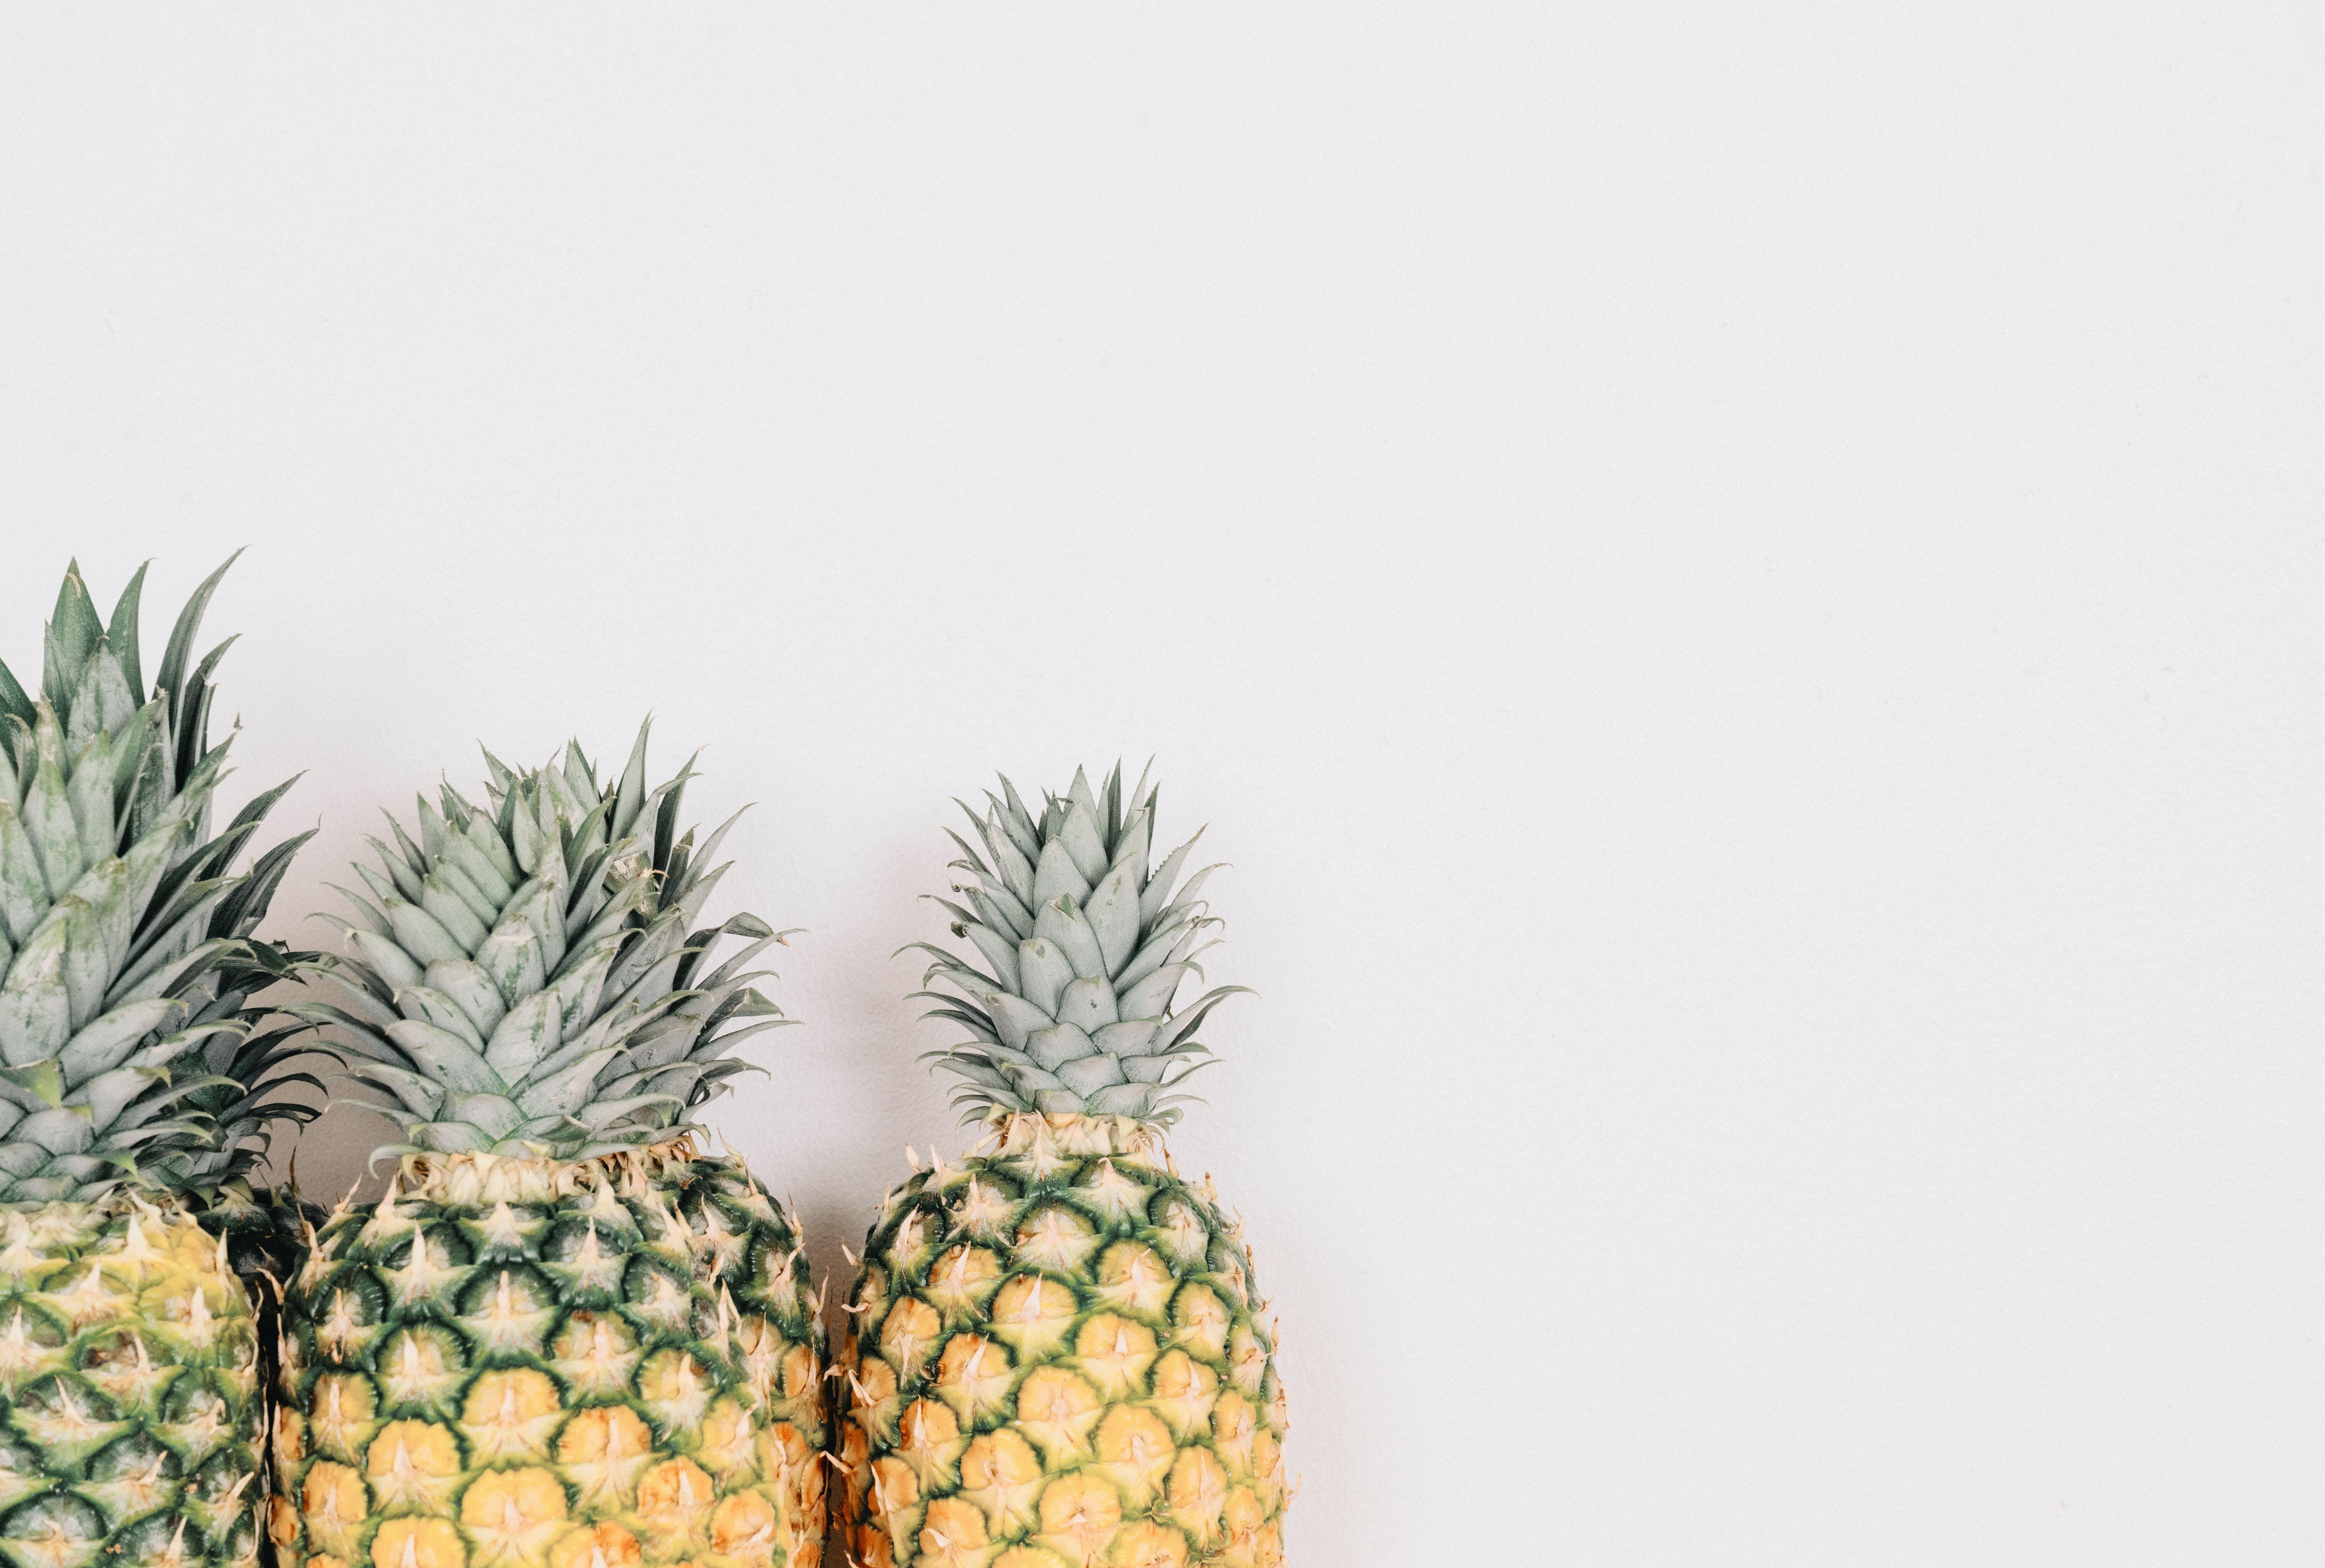 Three Pineapples Near White Wall